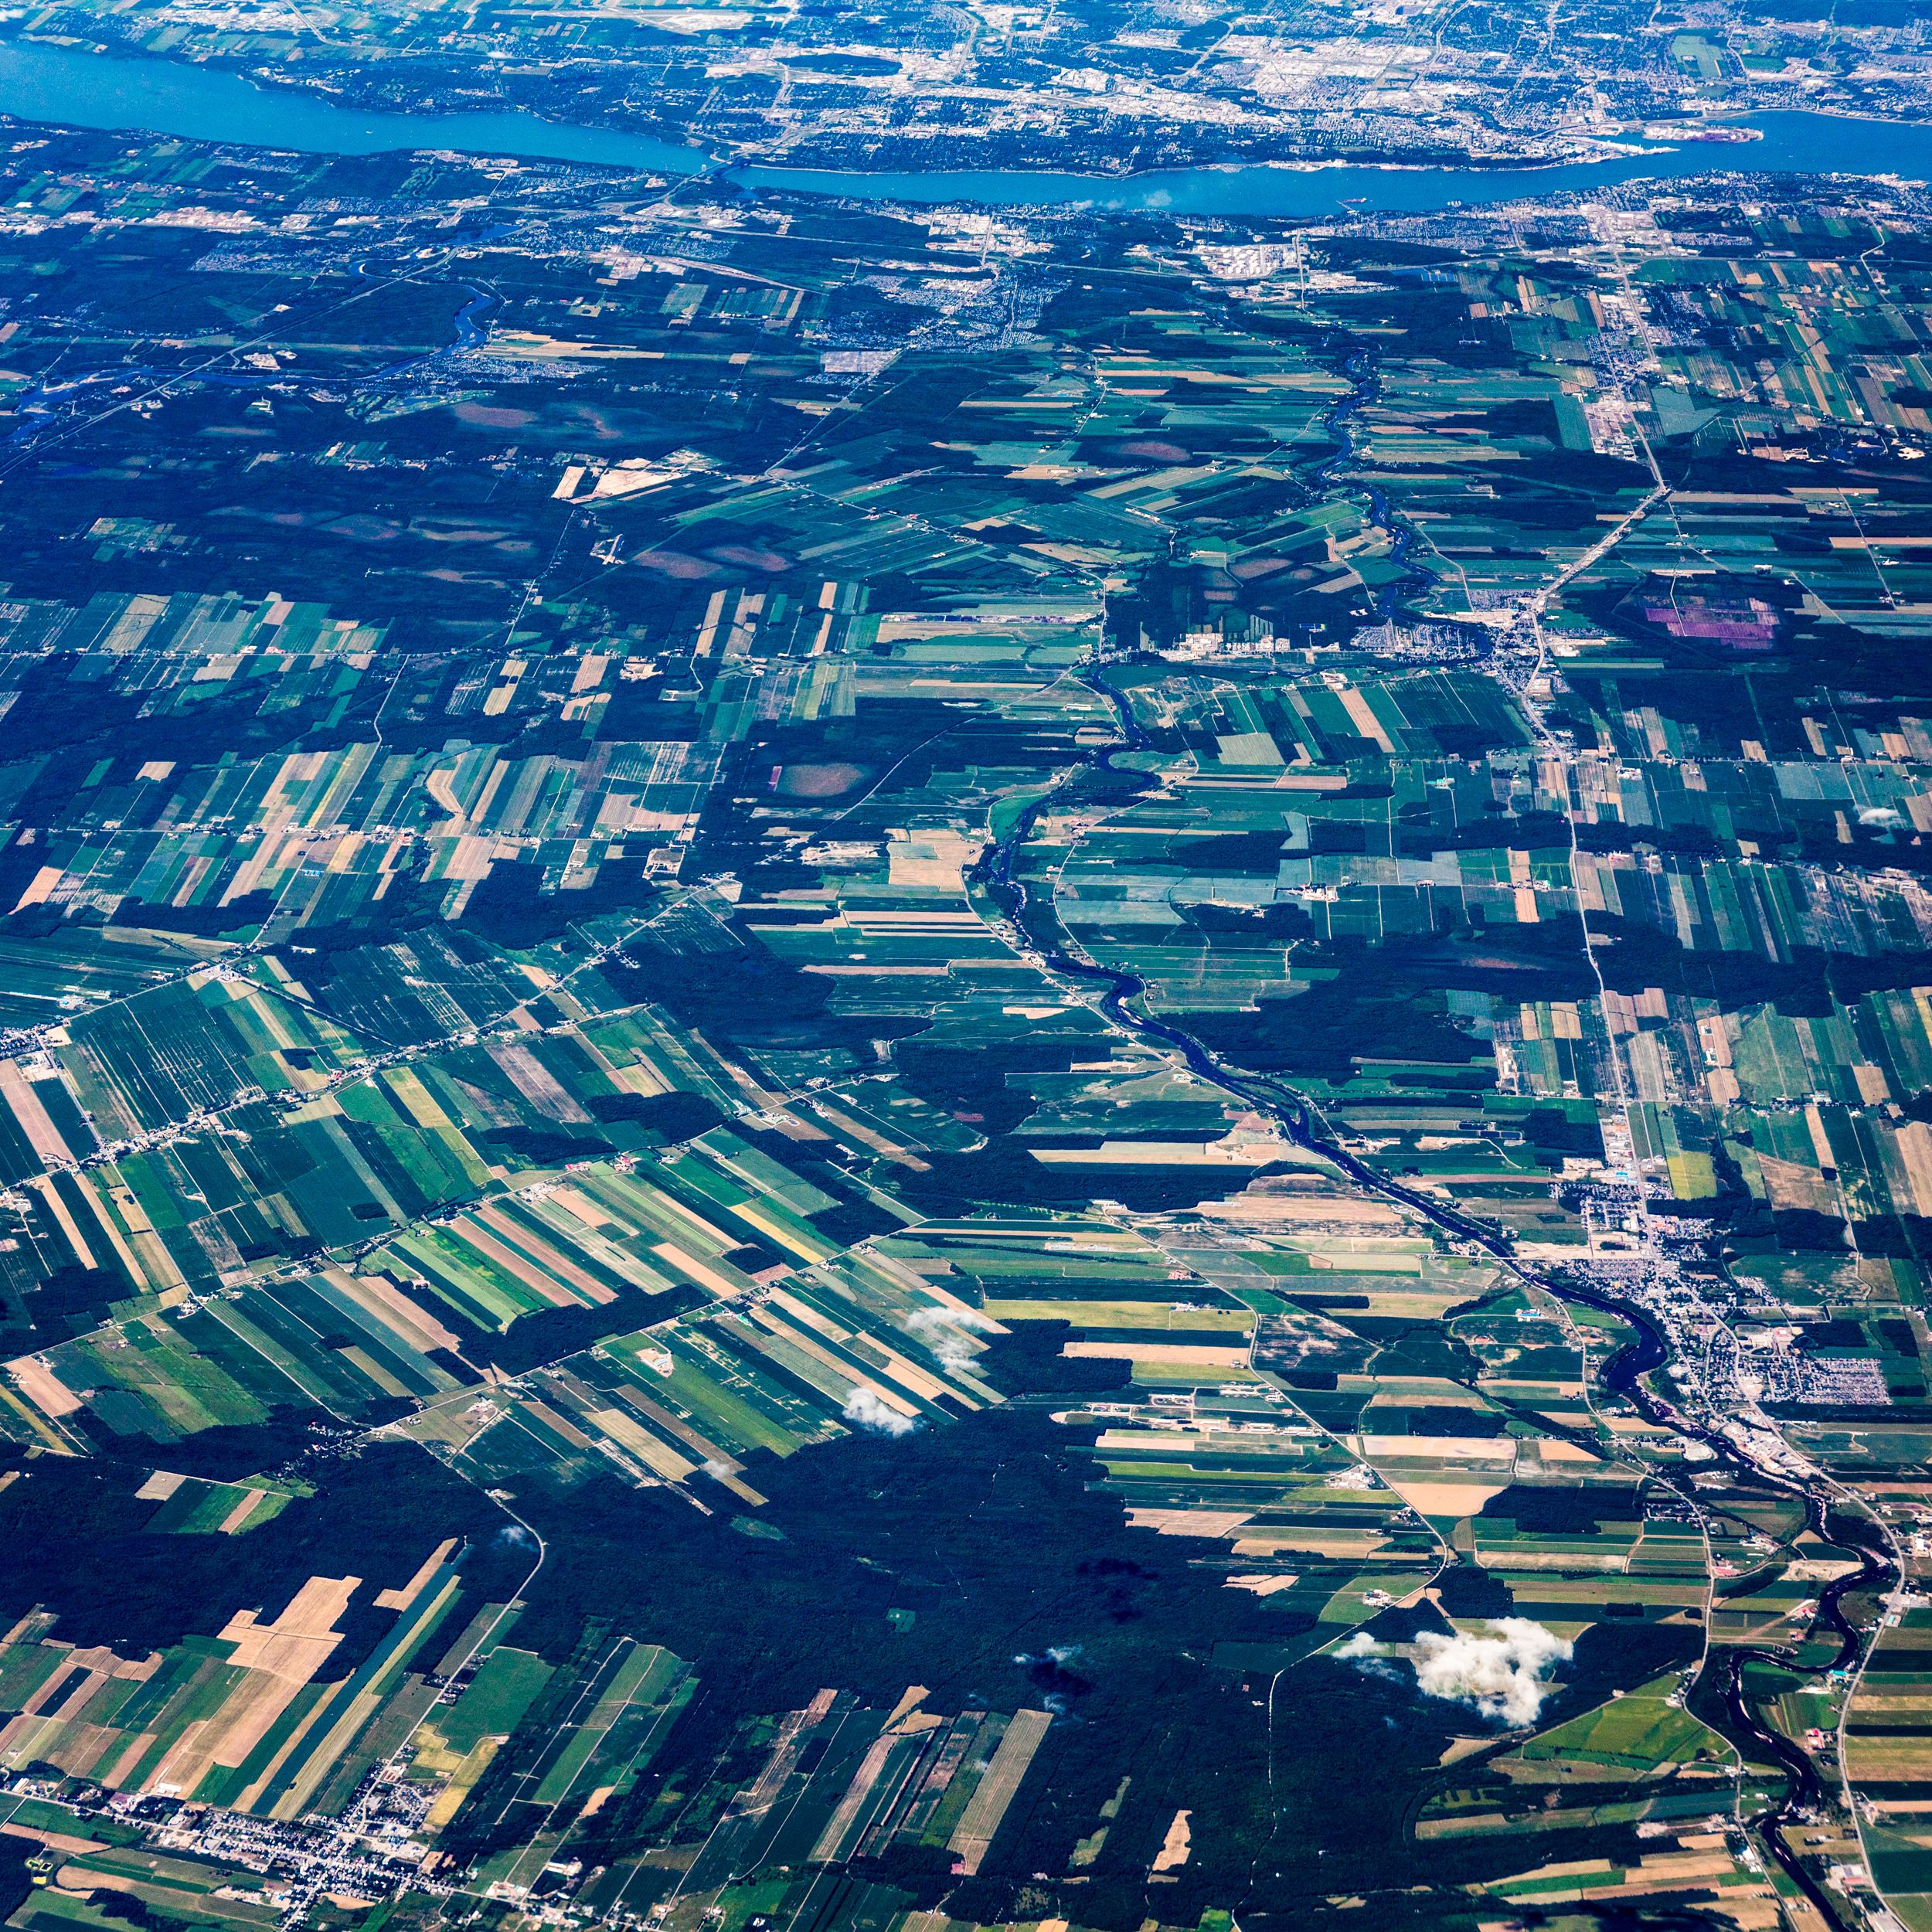 Aerials for Bannon 2019 (2.5k)-16.jpg